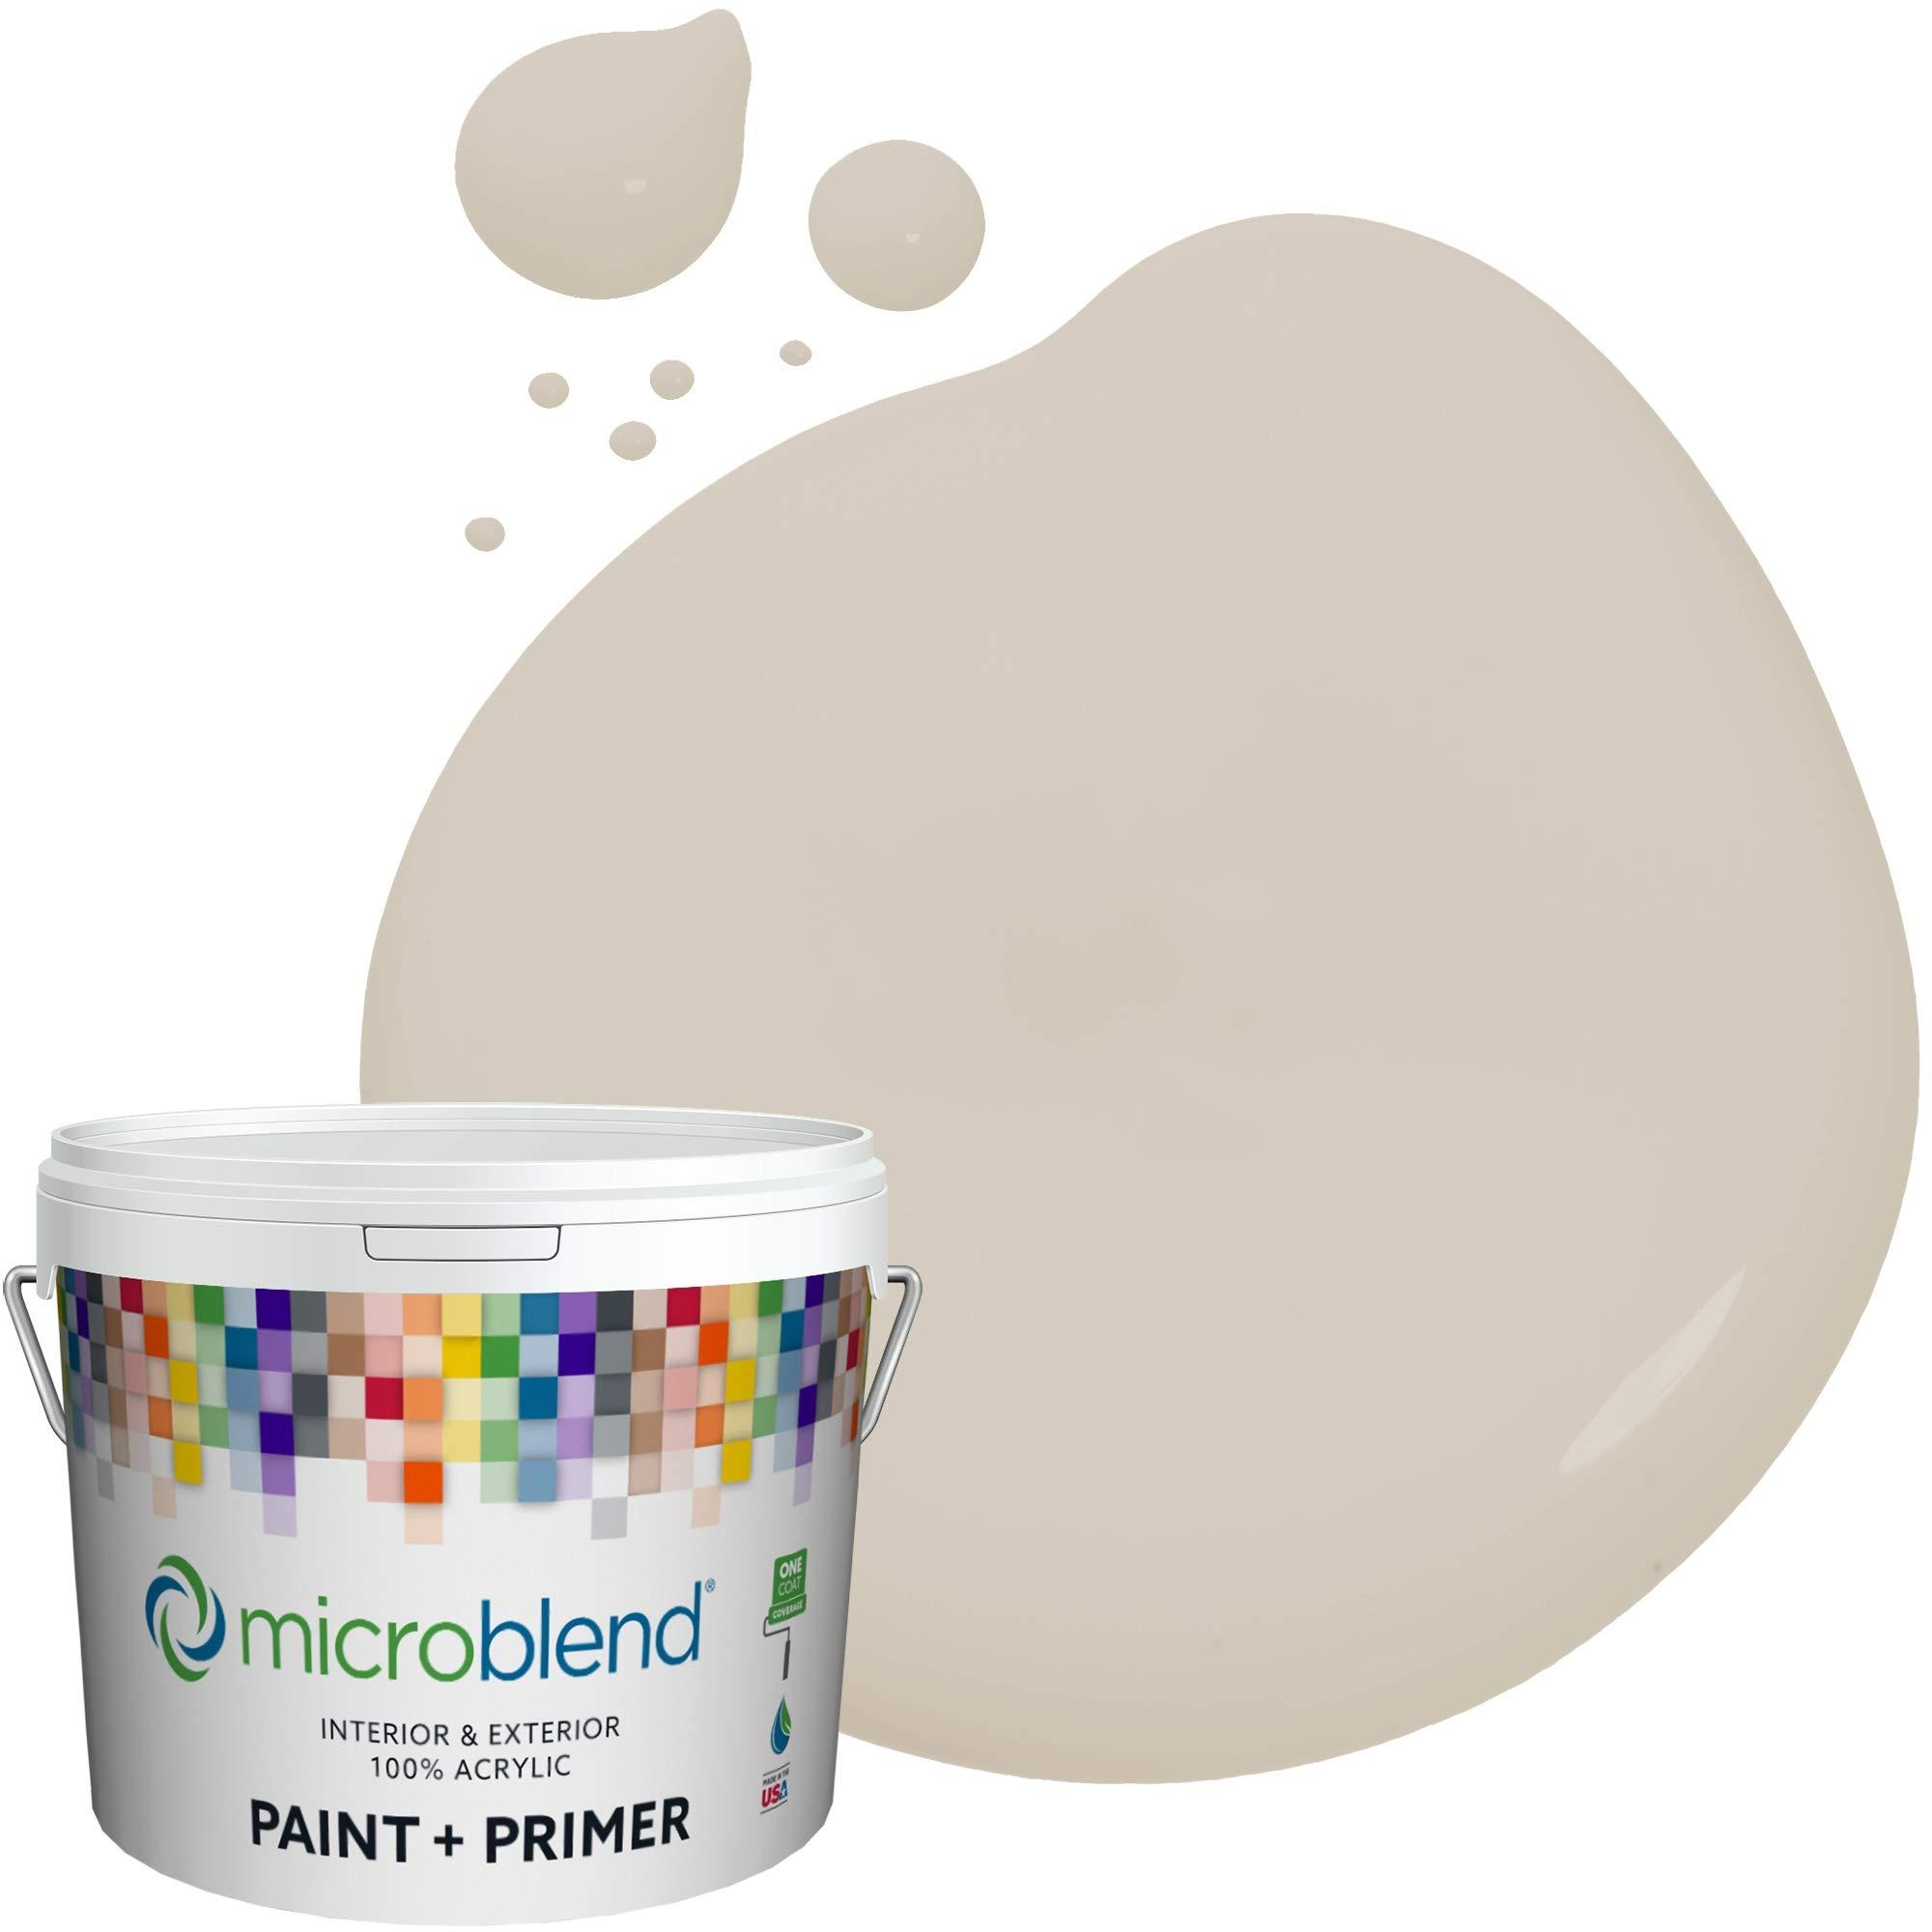 Microblend Interior Paint + Primer, Aged Linen, Semi-Gloss Sheen, 1 Gallon, Custom Made, Premium Quality One Coat Hide & Washable Paint (73241-2-M1588B3(C))